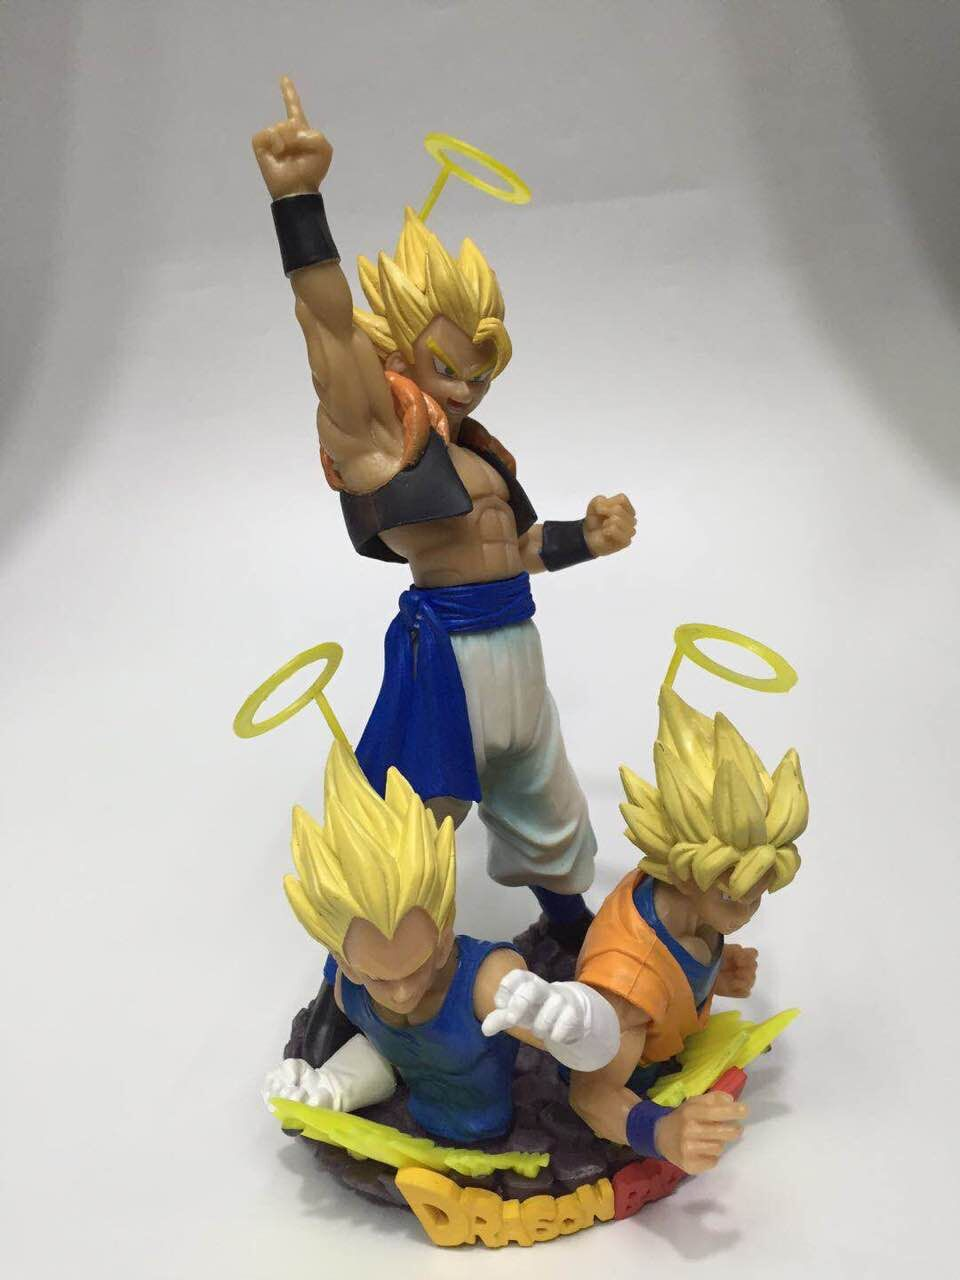 Dragon Ball Z Action Figure Vegeta Goku Gogeta Bust PVC Figure Toy 150mm Dragon Ball Dragon Ball Super Gogeta Model